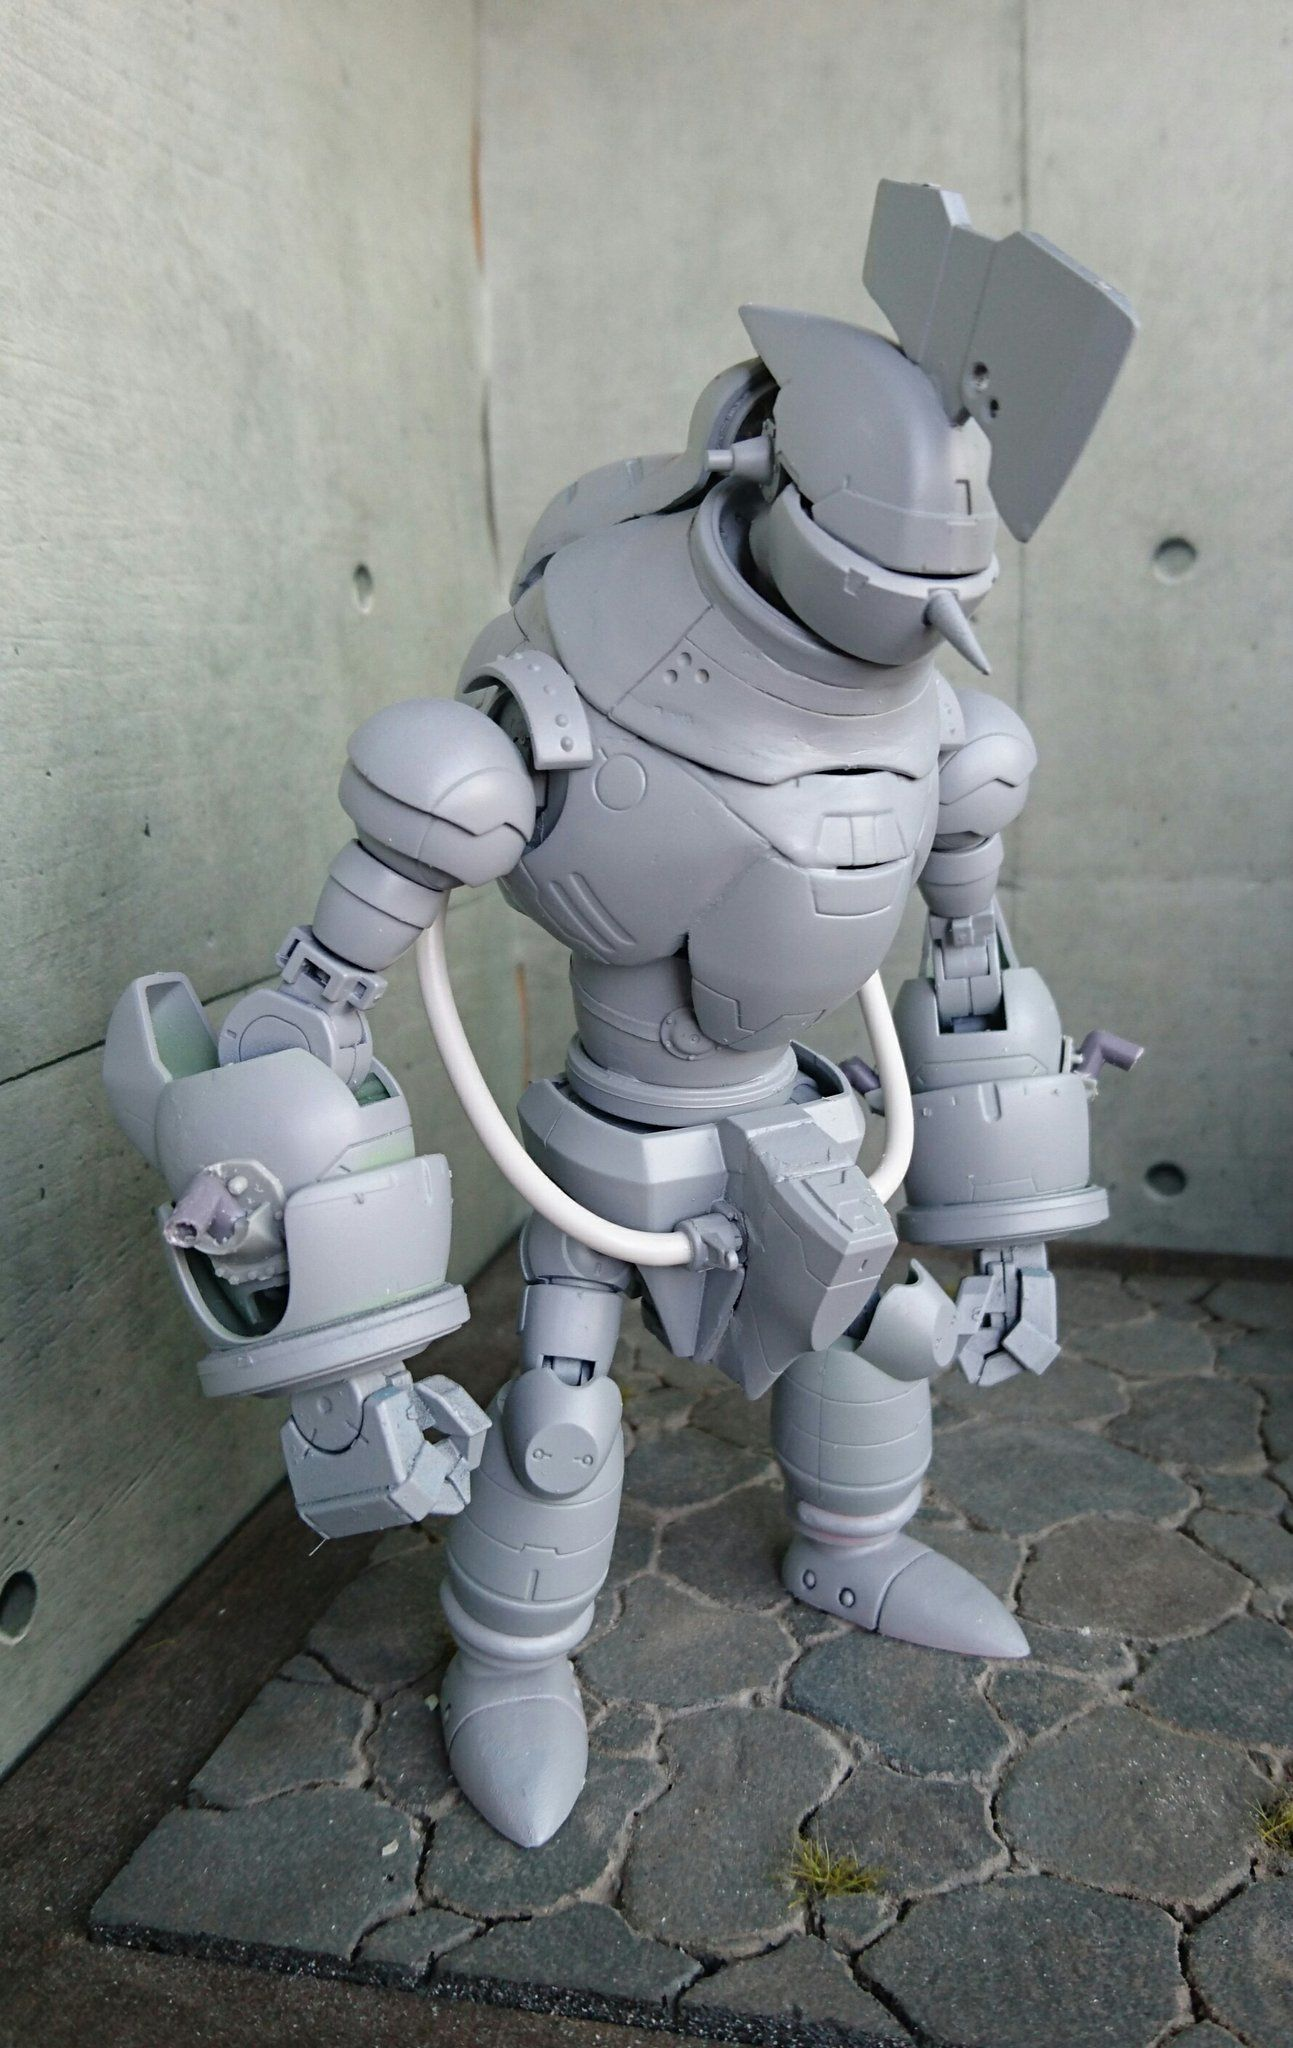 dcgz weuiae7yyu jpg orig 1293 2048 ロボットアート 人型 ロボット 鉄人